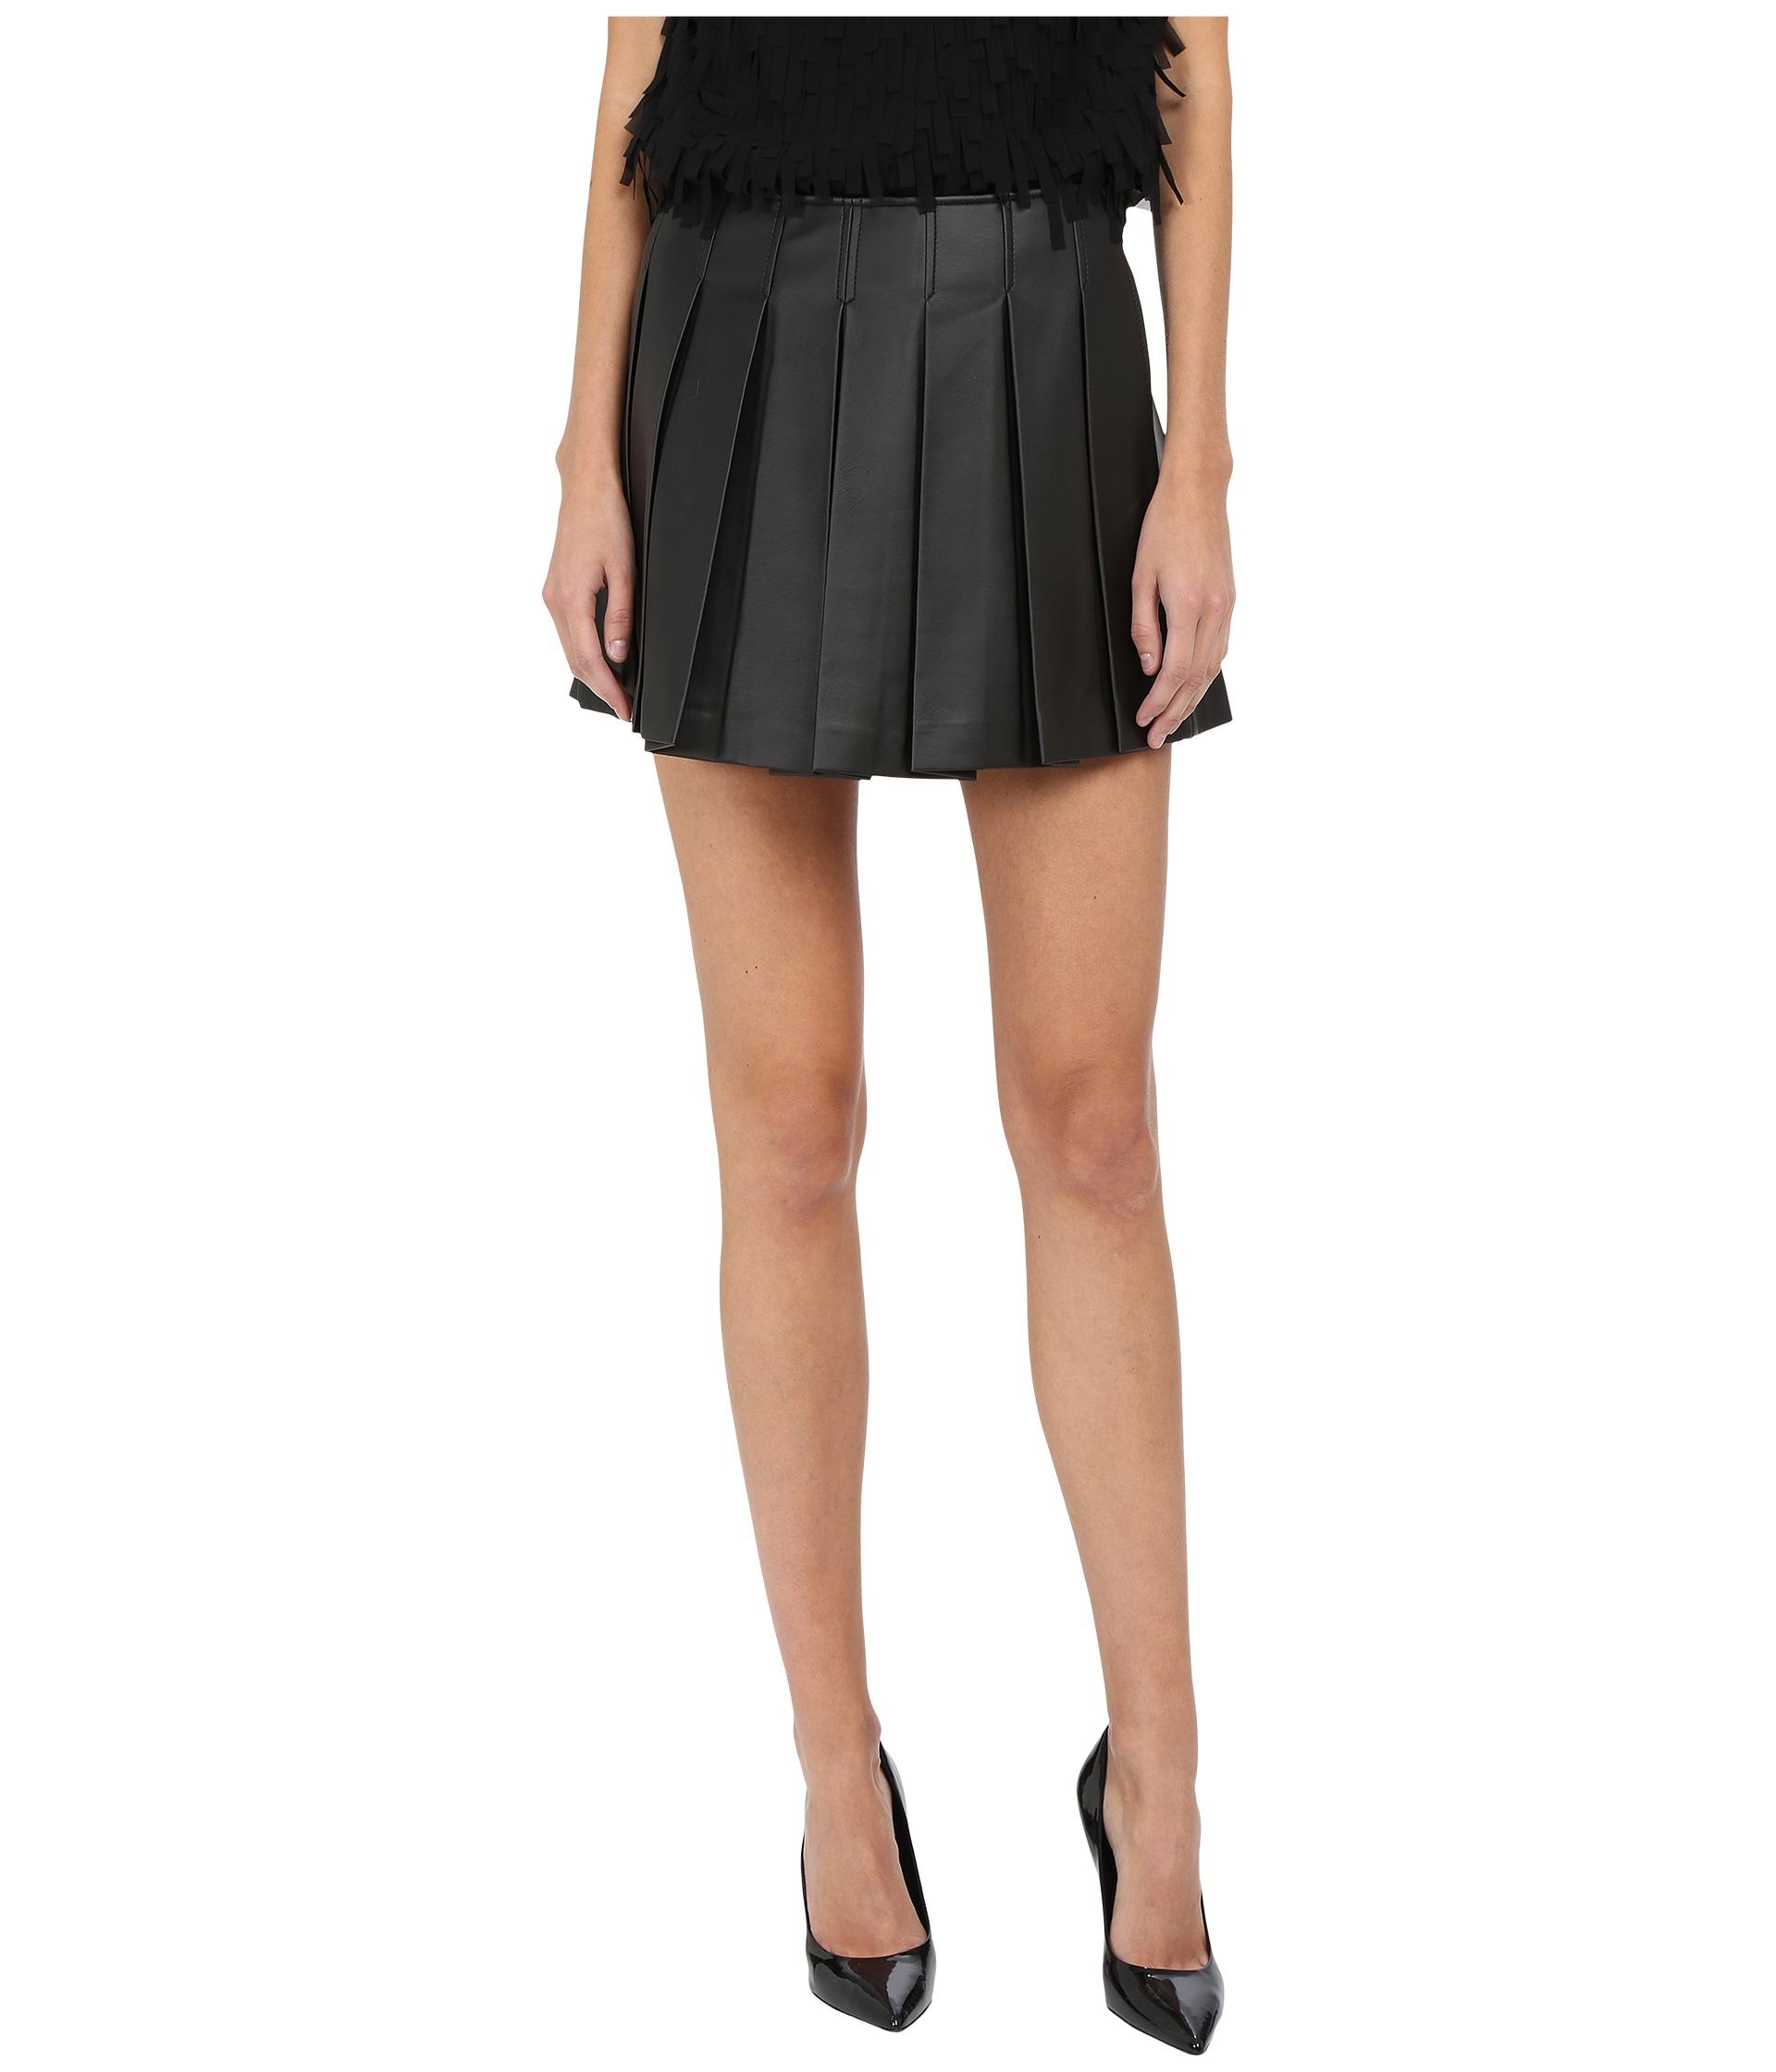 armani leather mini skirt in black lyst